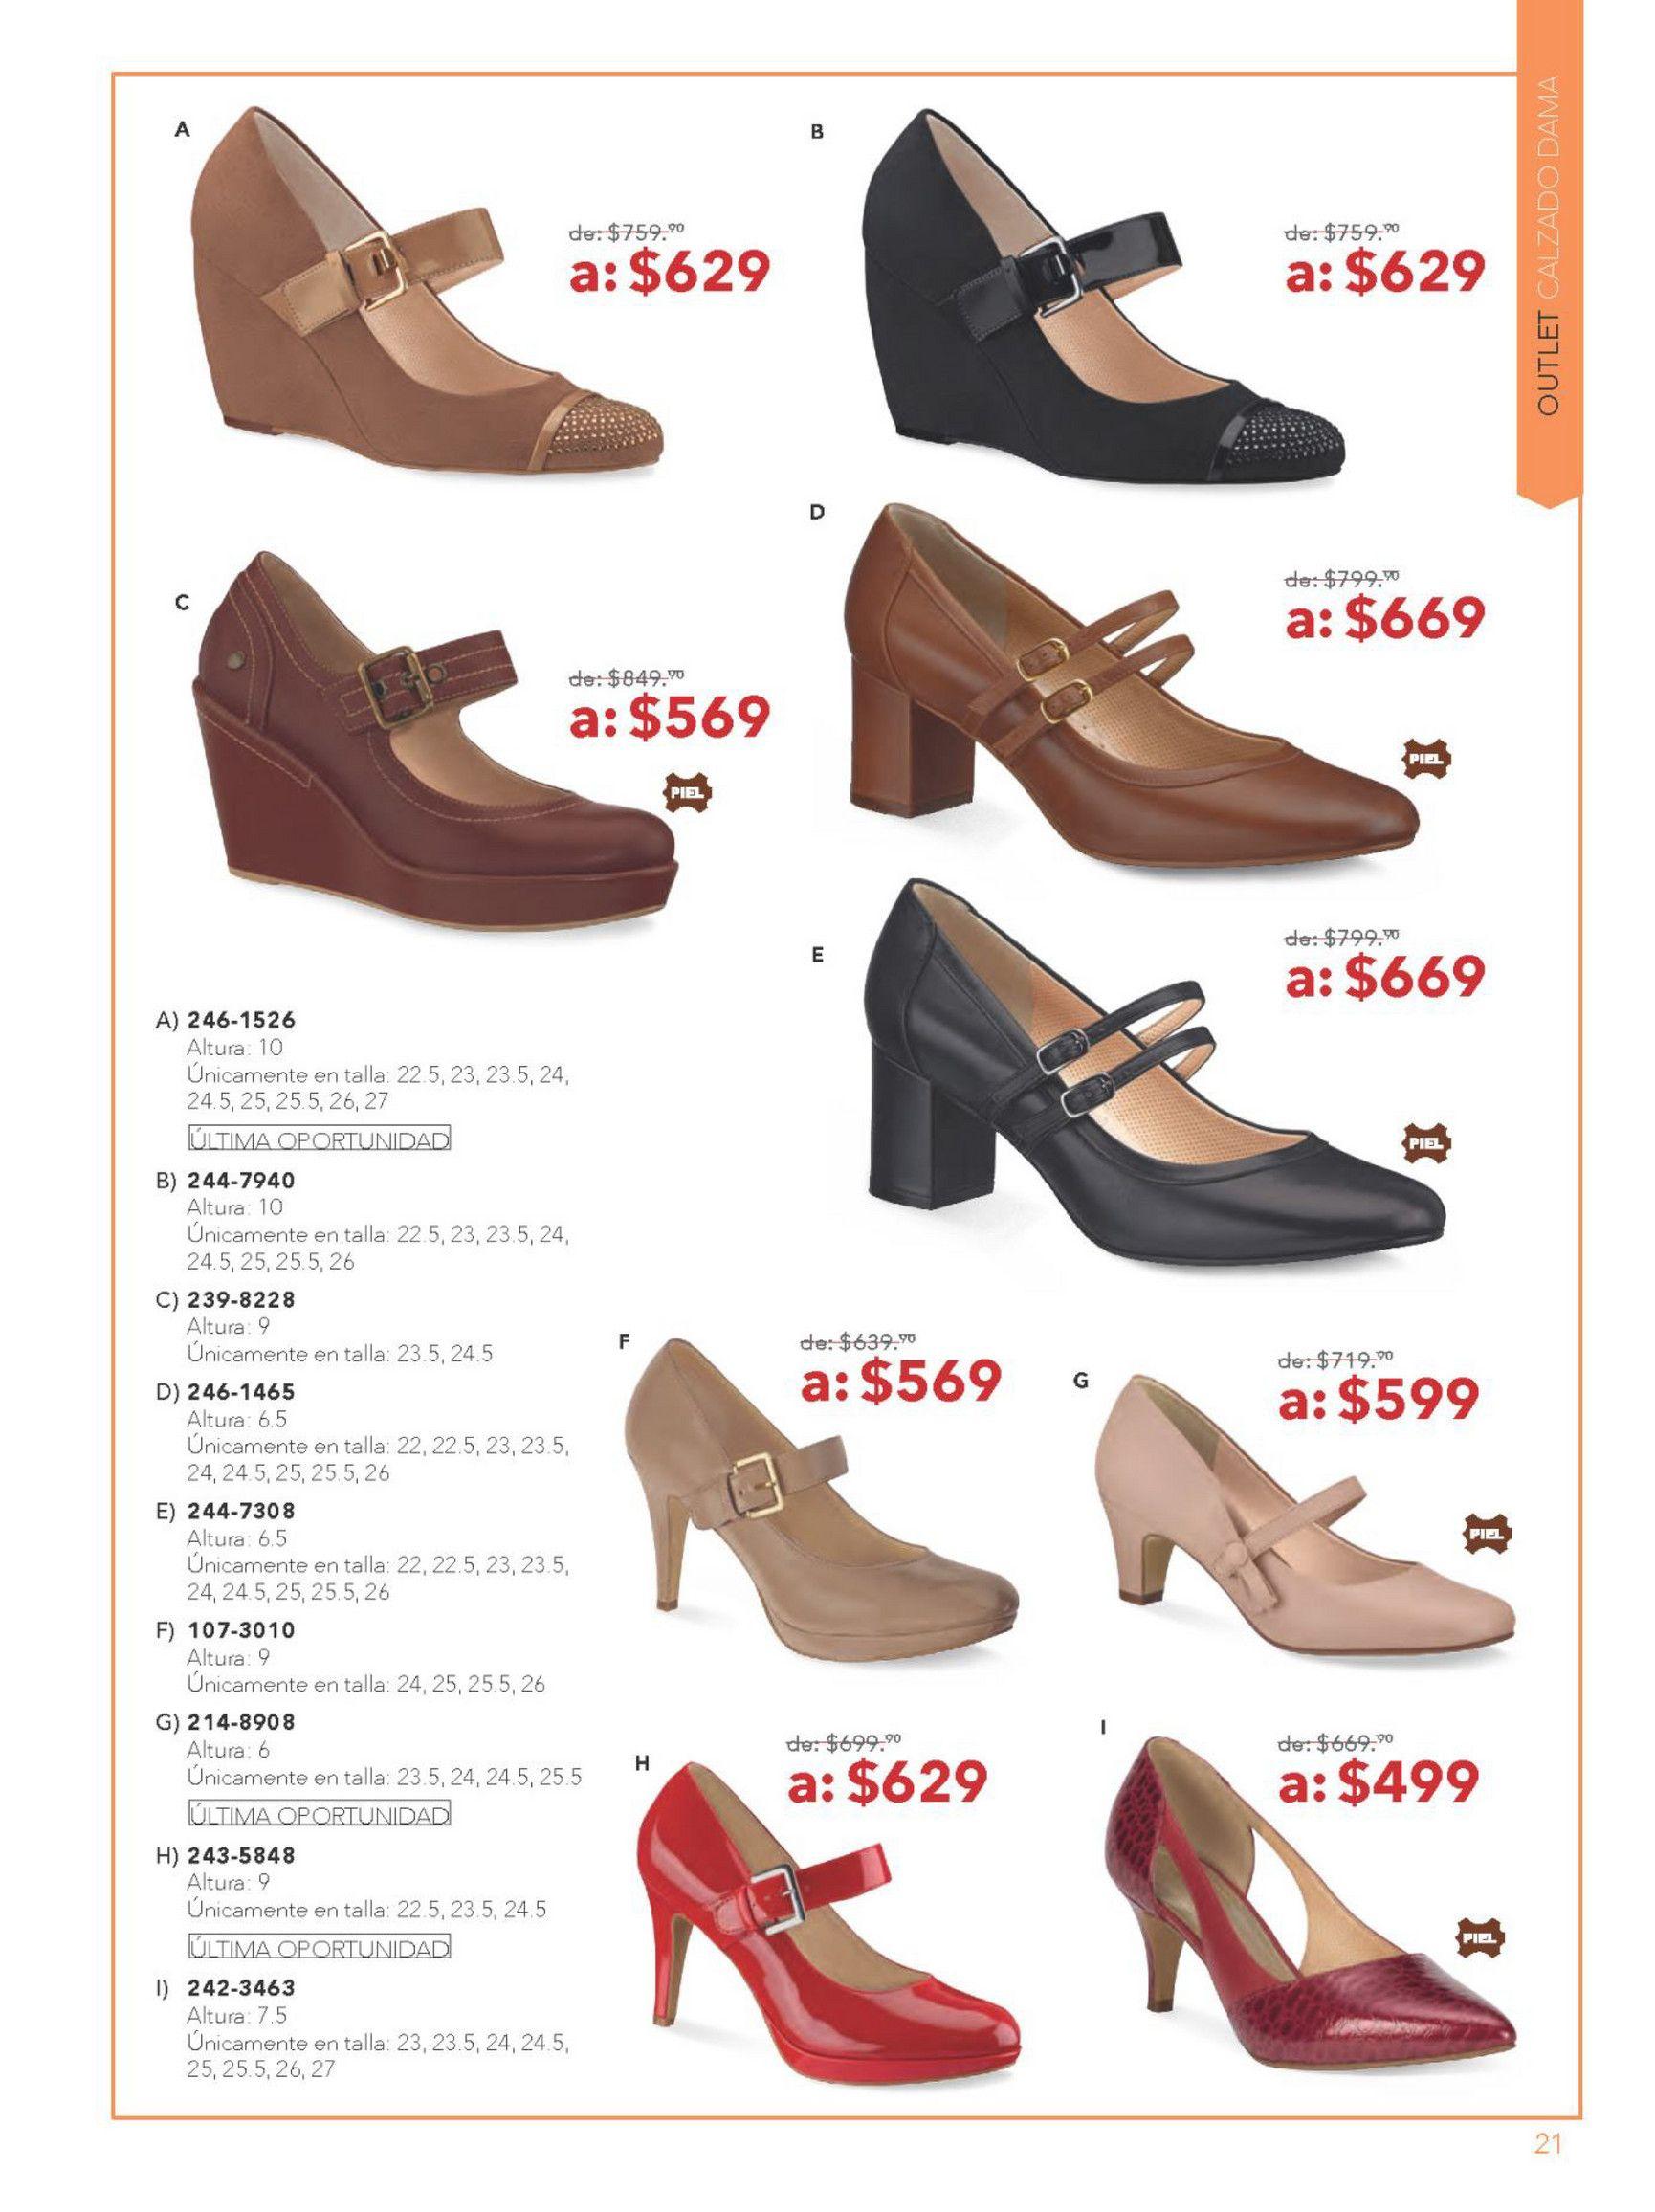 Folleto De Andrea Outlet Febrero18 Puedes Ver Mas Catalogos De Ropa Y Zapatos En Www Catalogosmx Moda Oxford Shoes Shoes Womens Oxfords